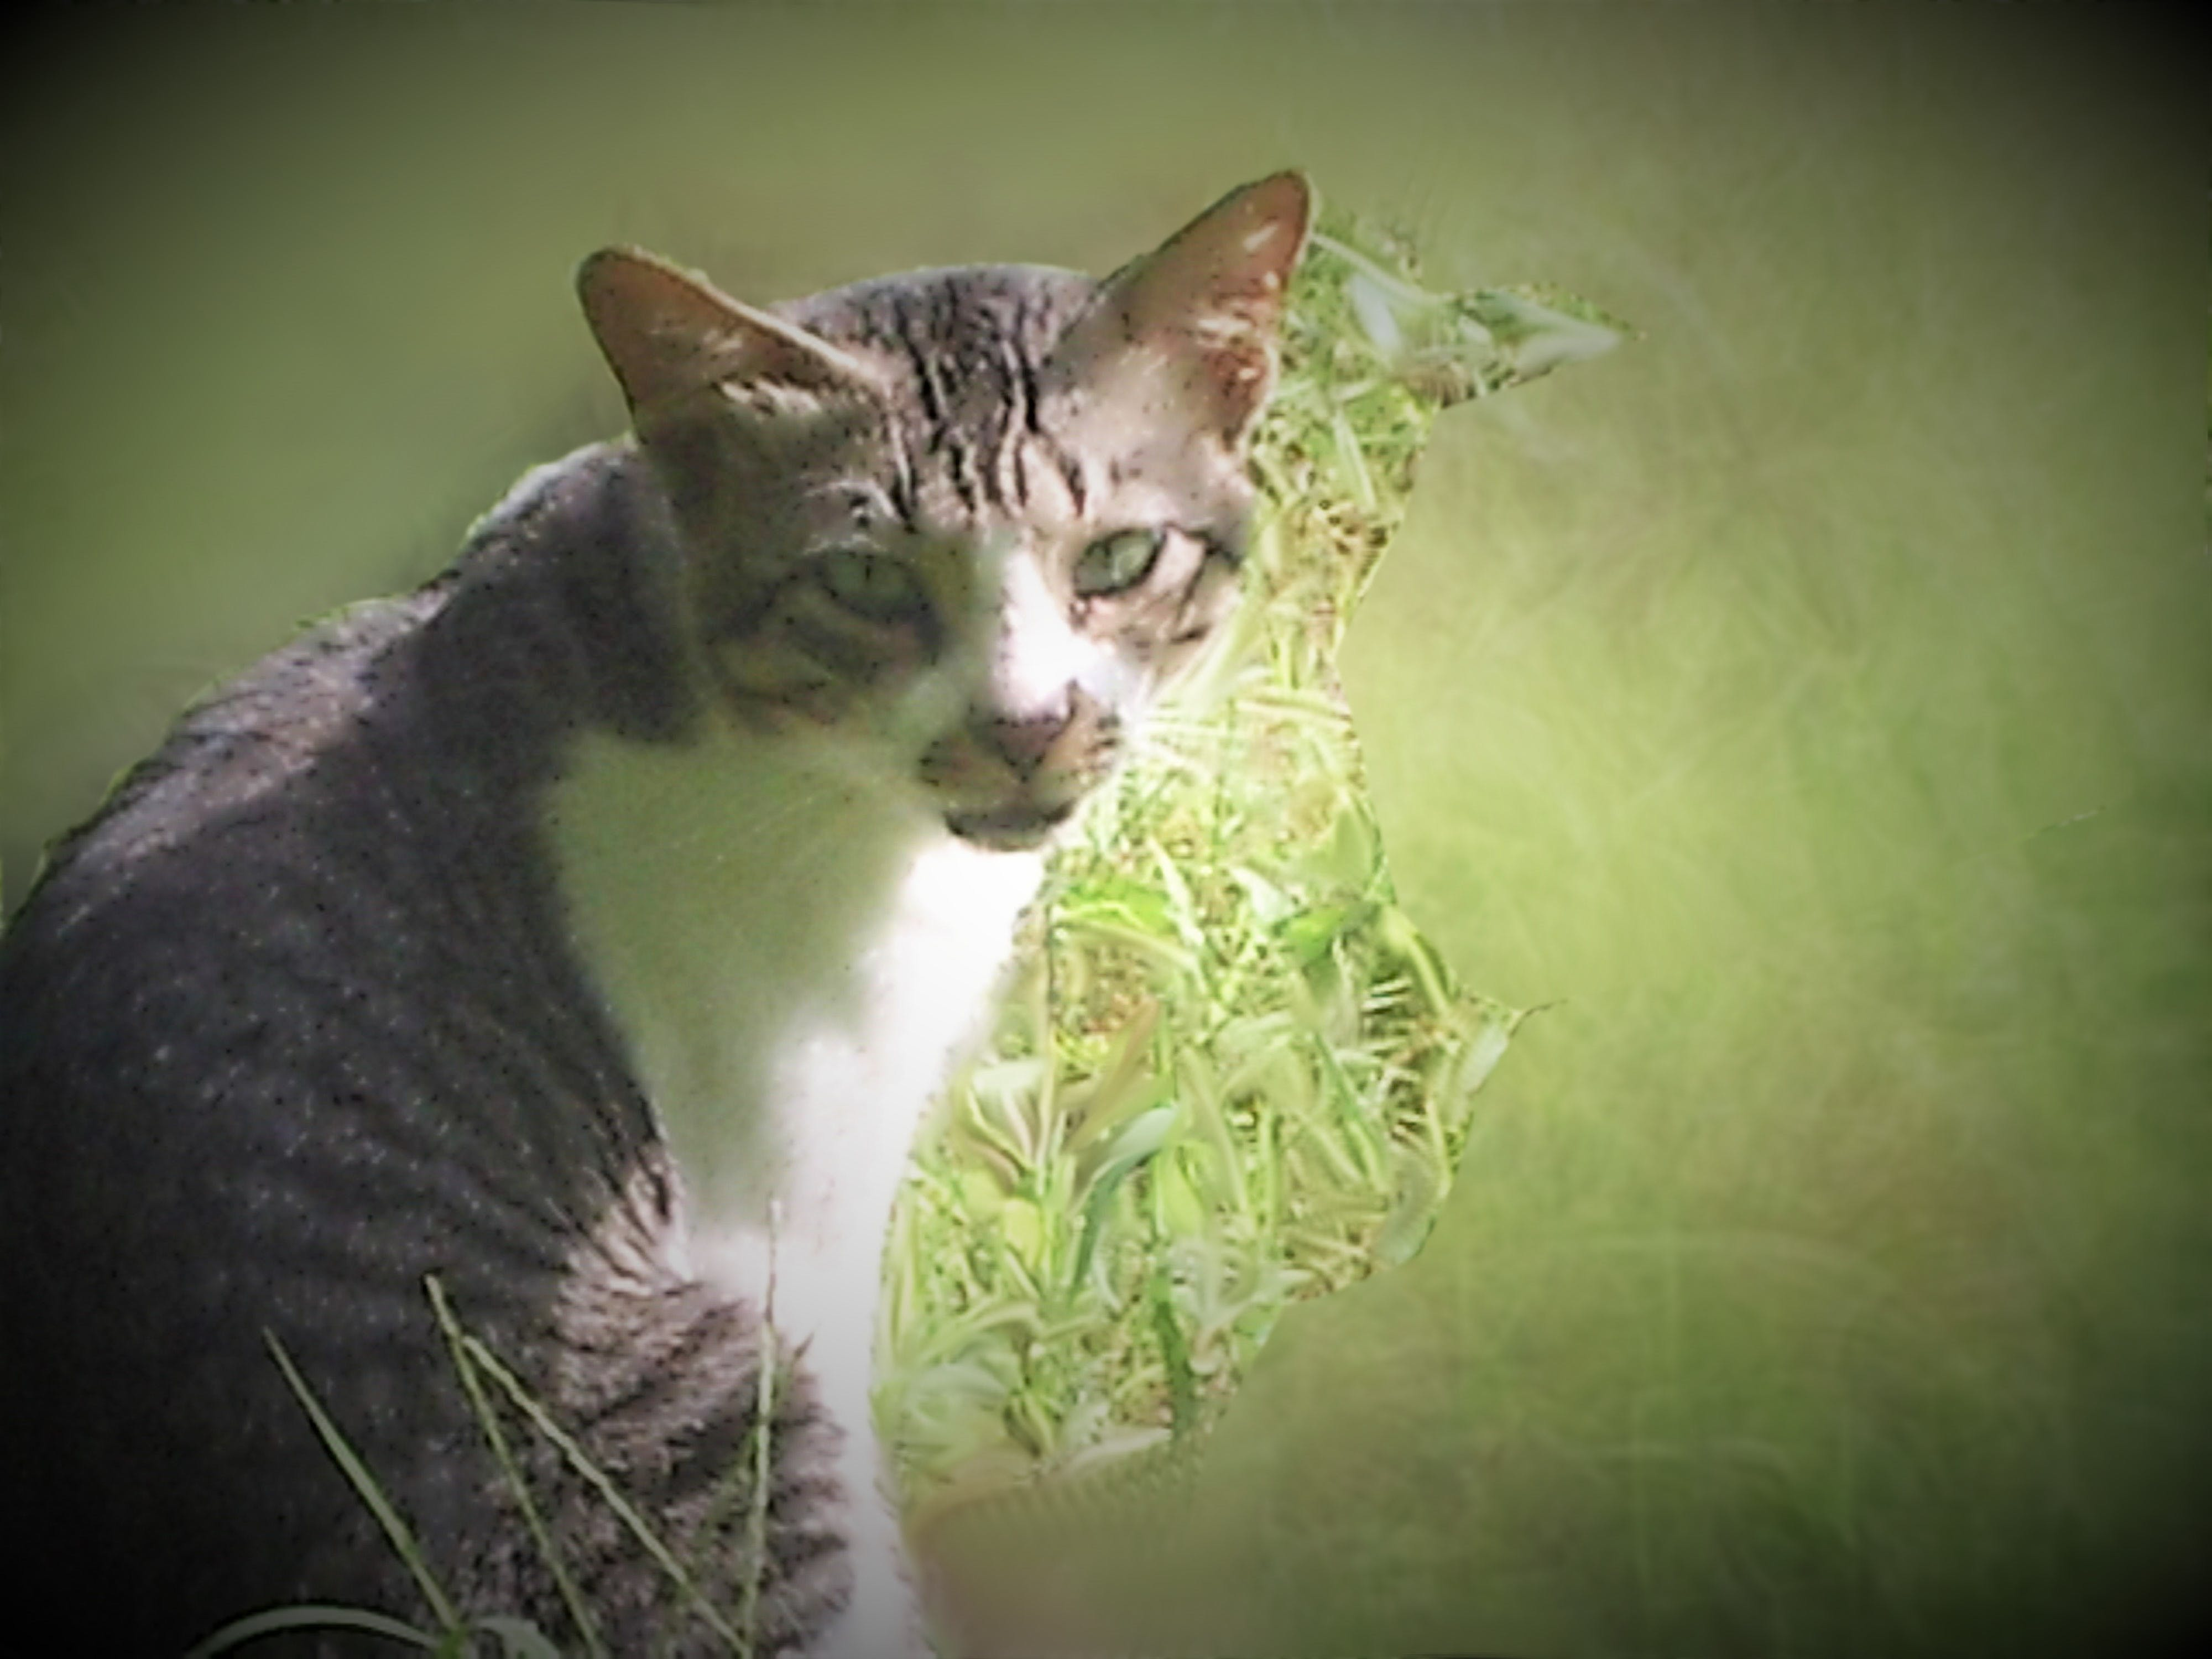 Free stock photo of cat, cat eye, cat face, nature photo